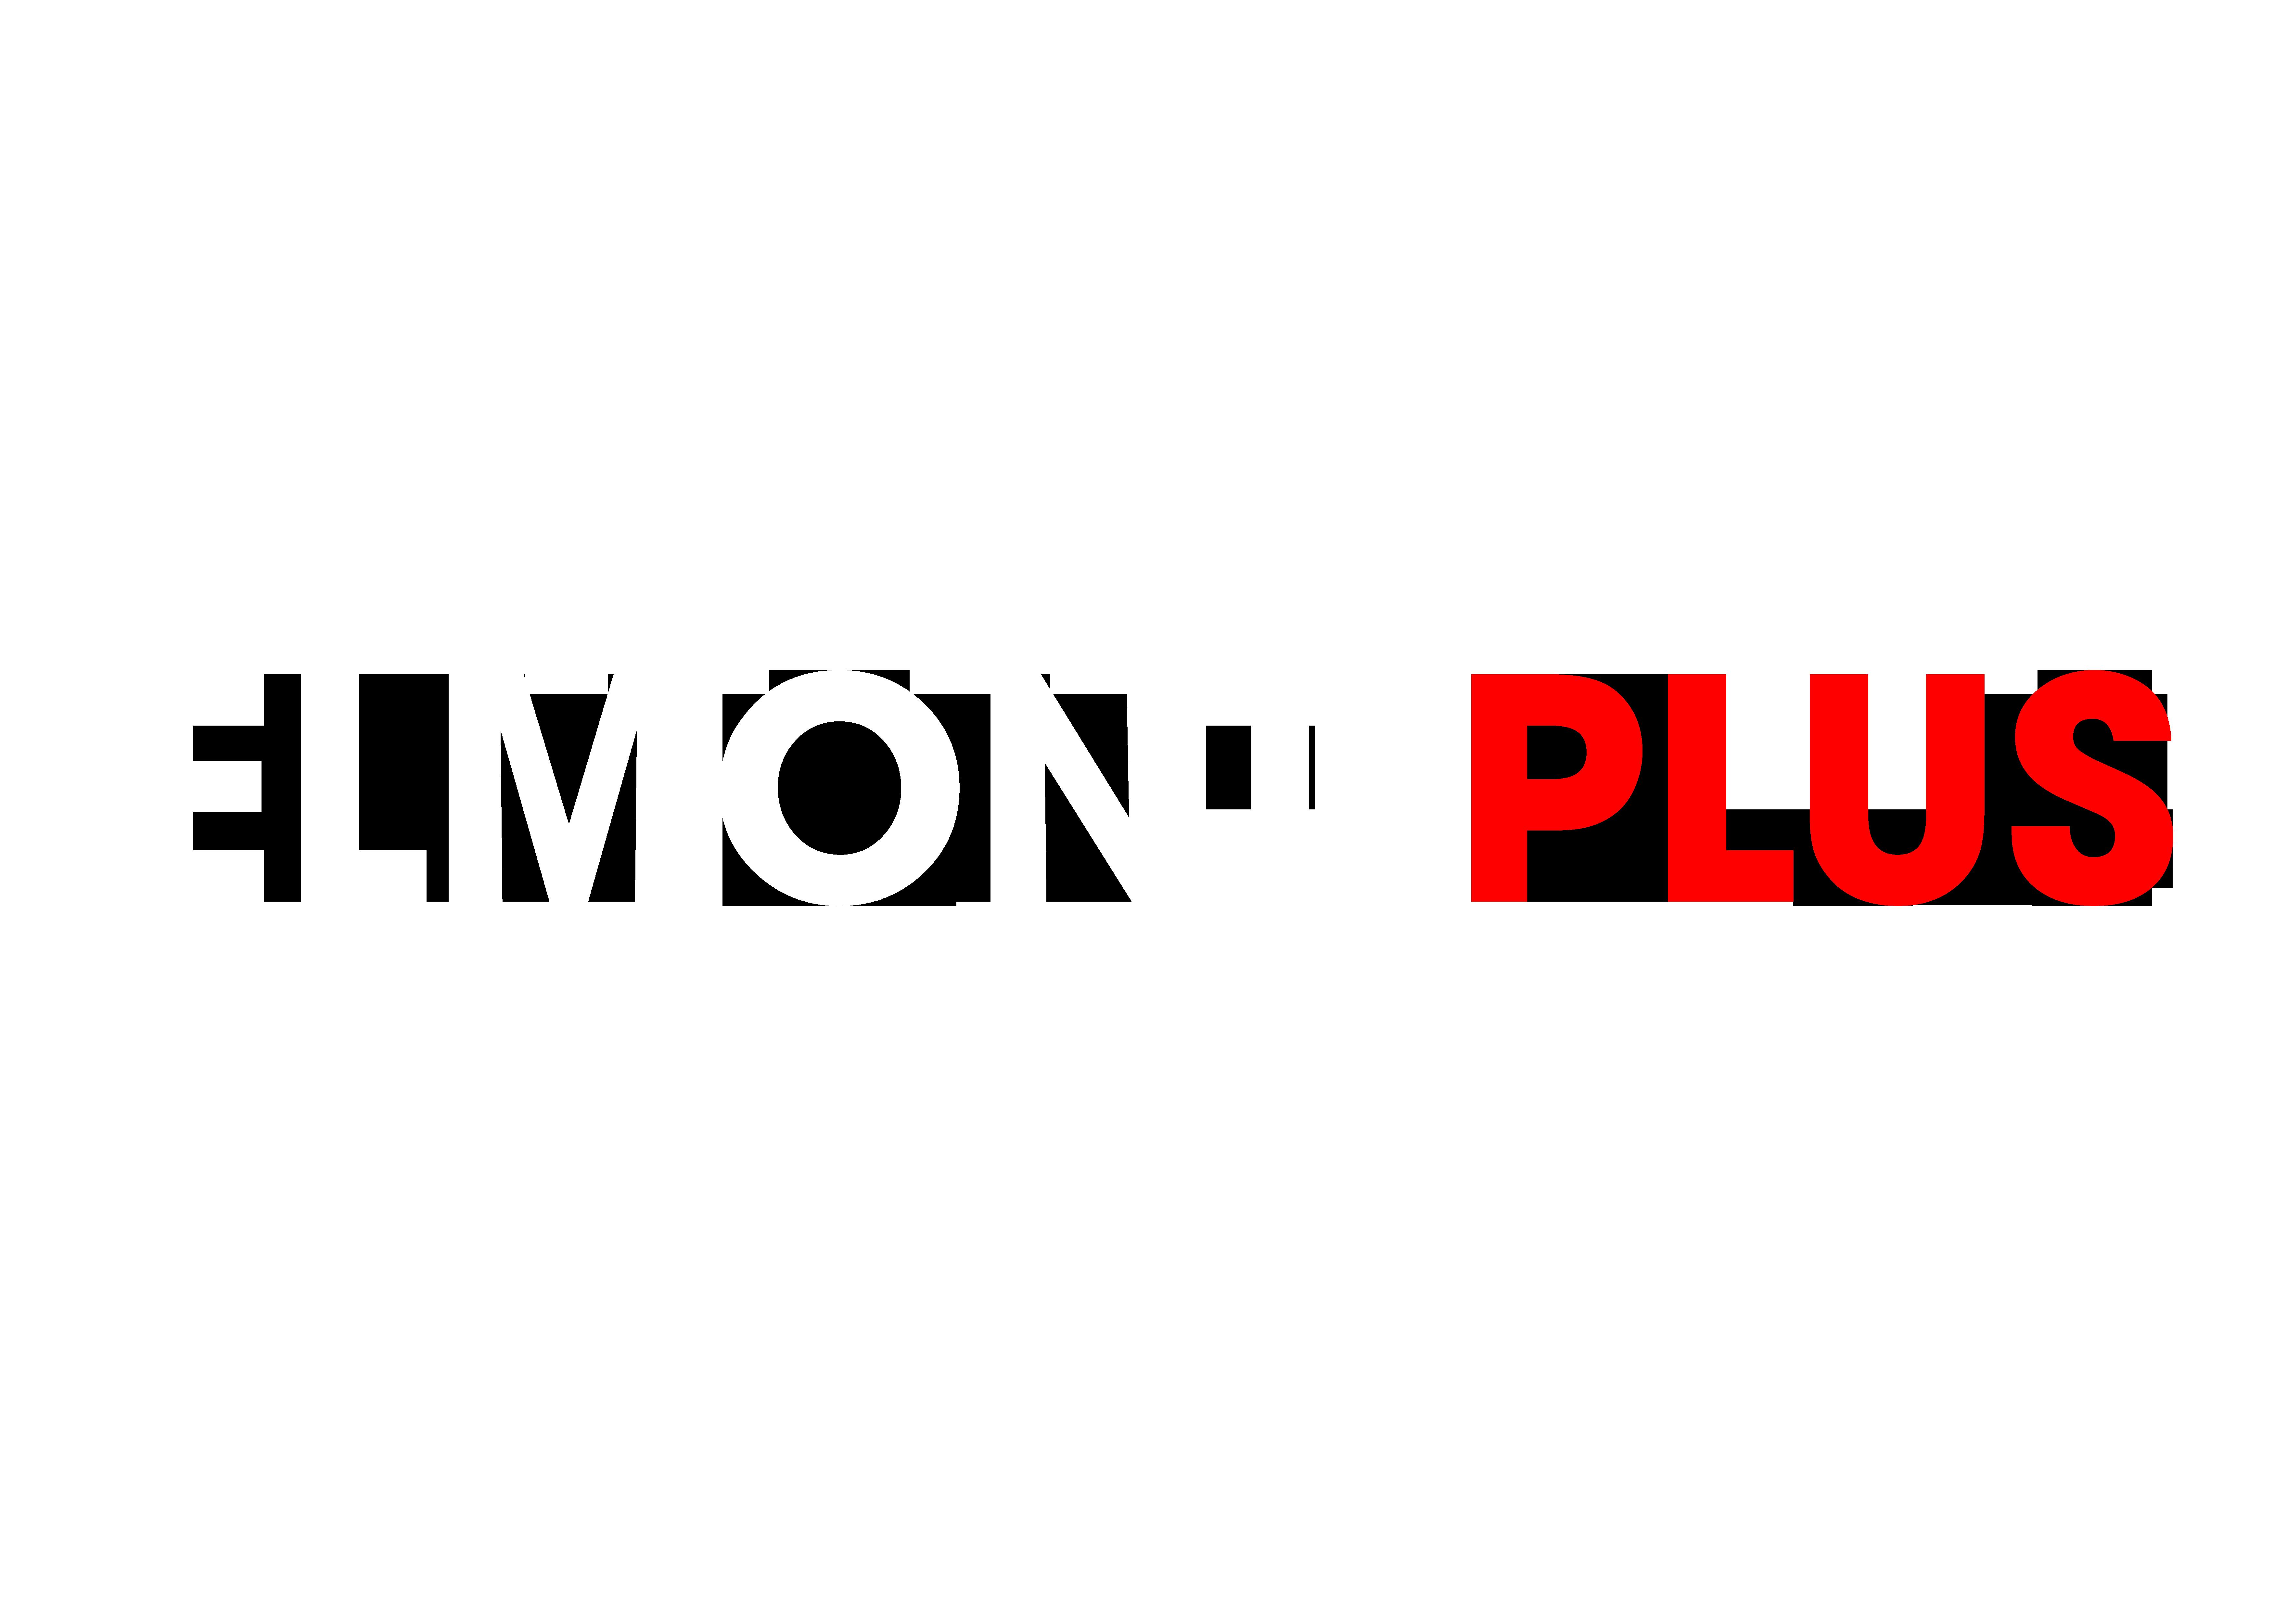 elmontplus.sk